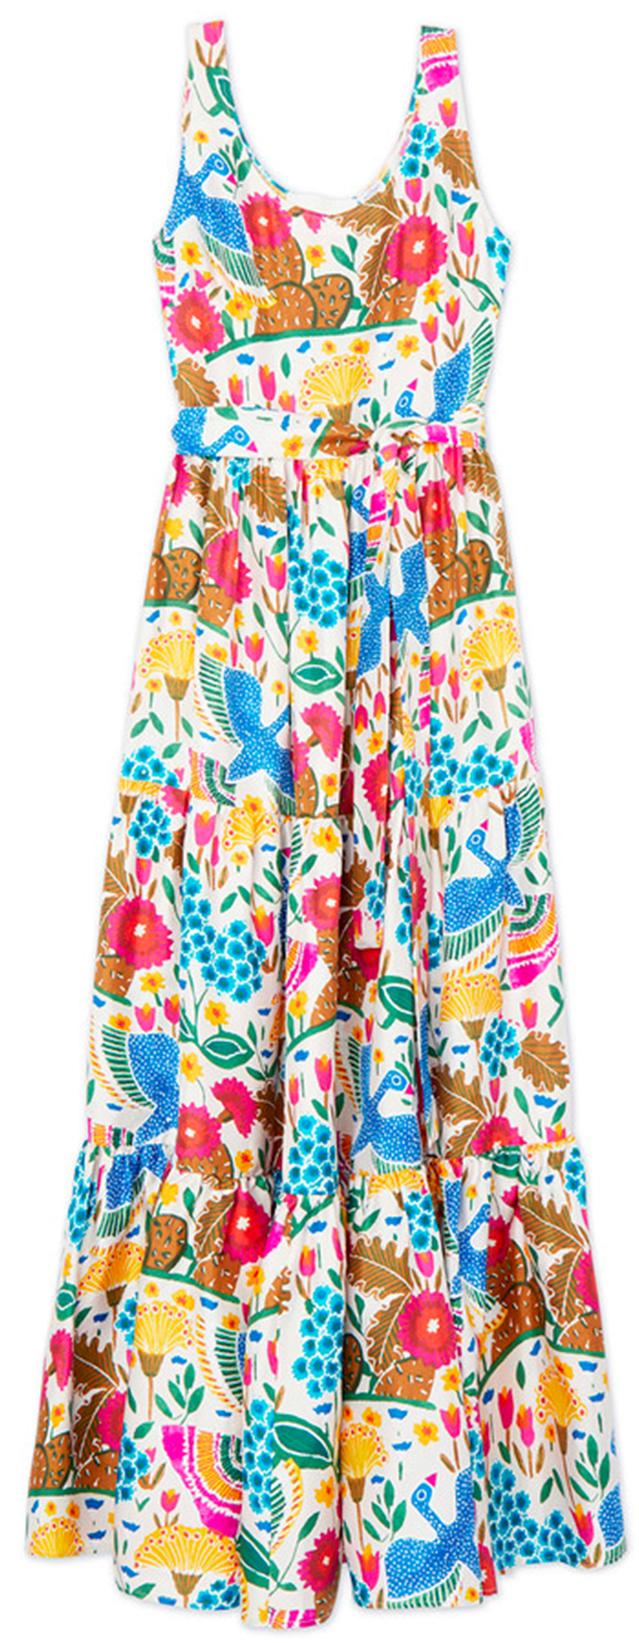 goop x La DoubleJ Dress